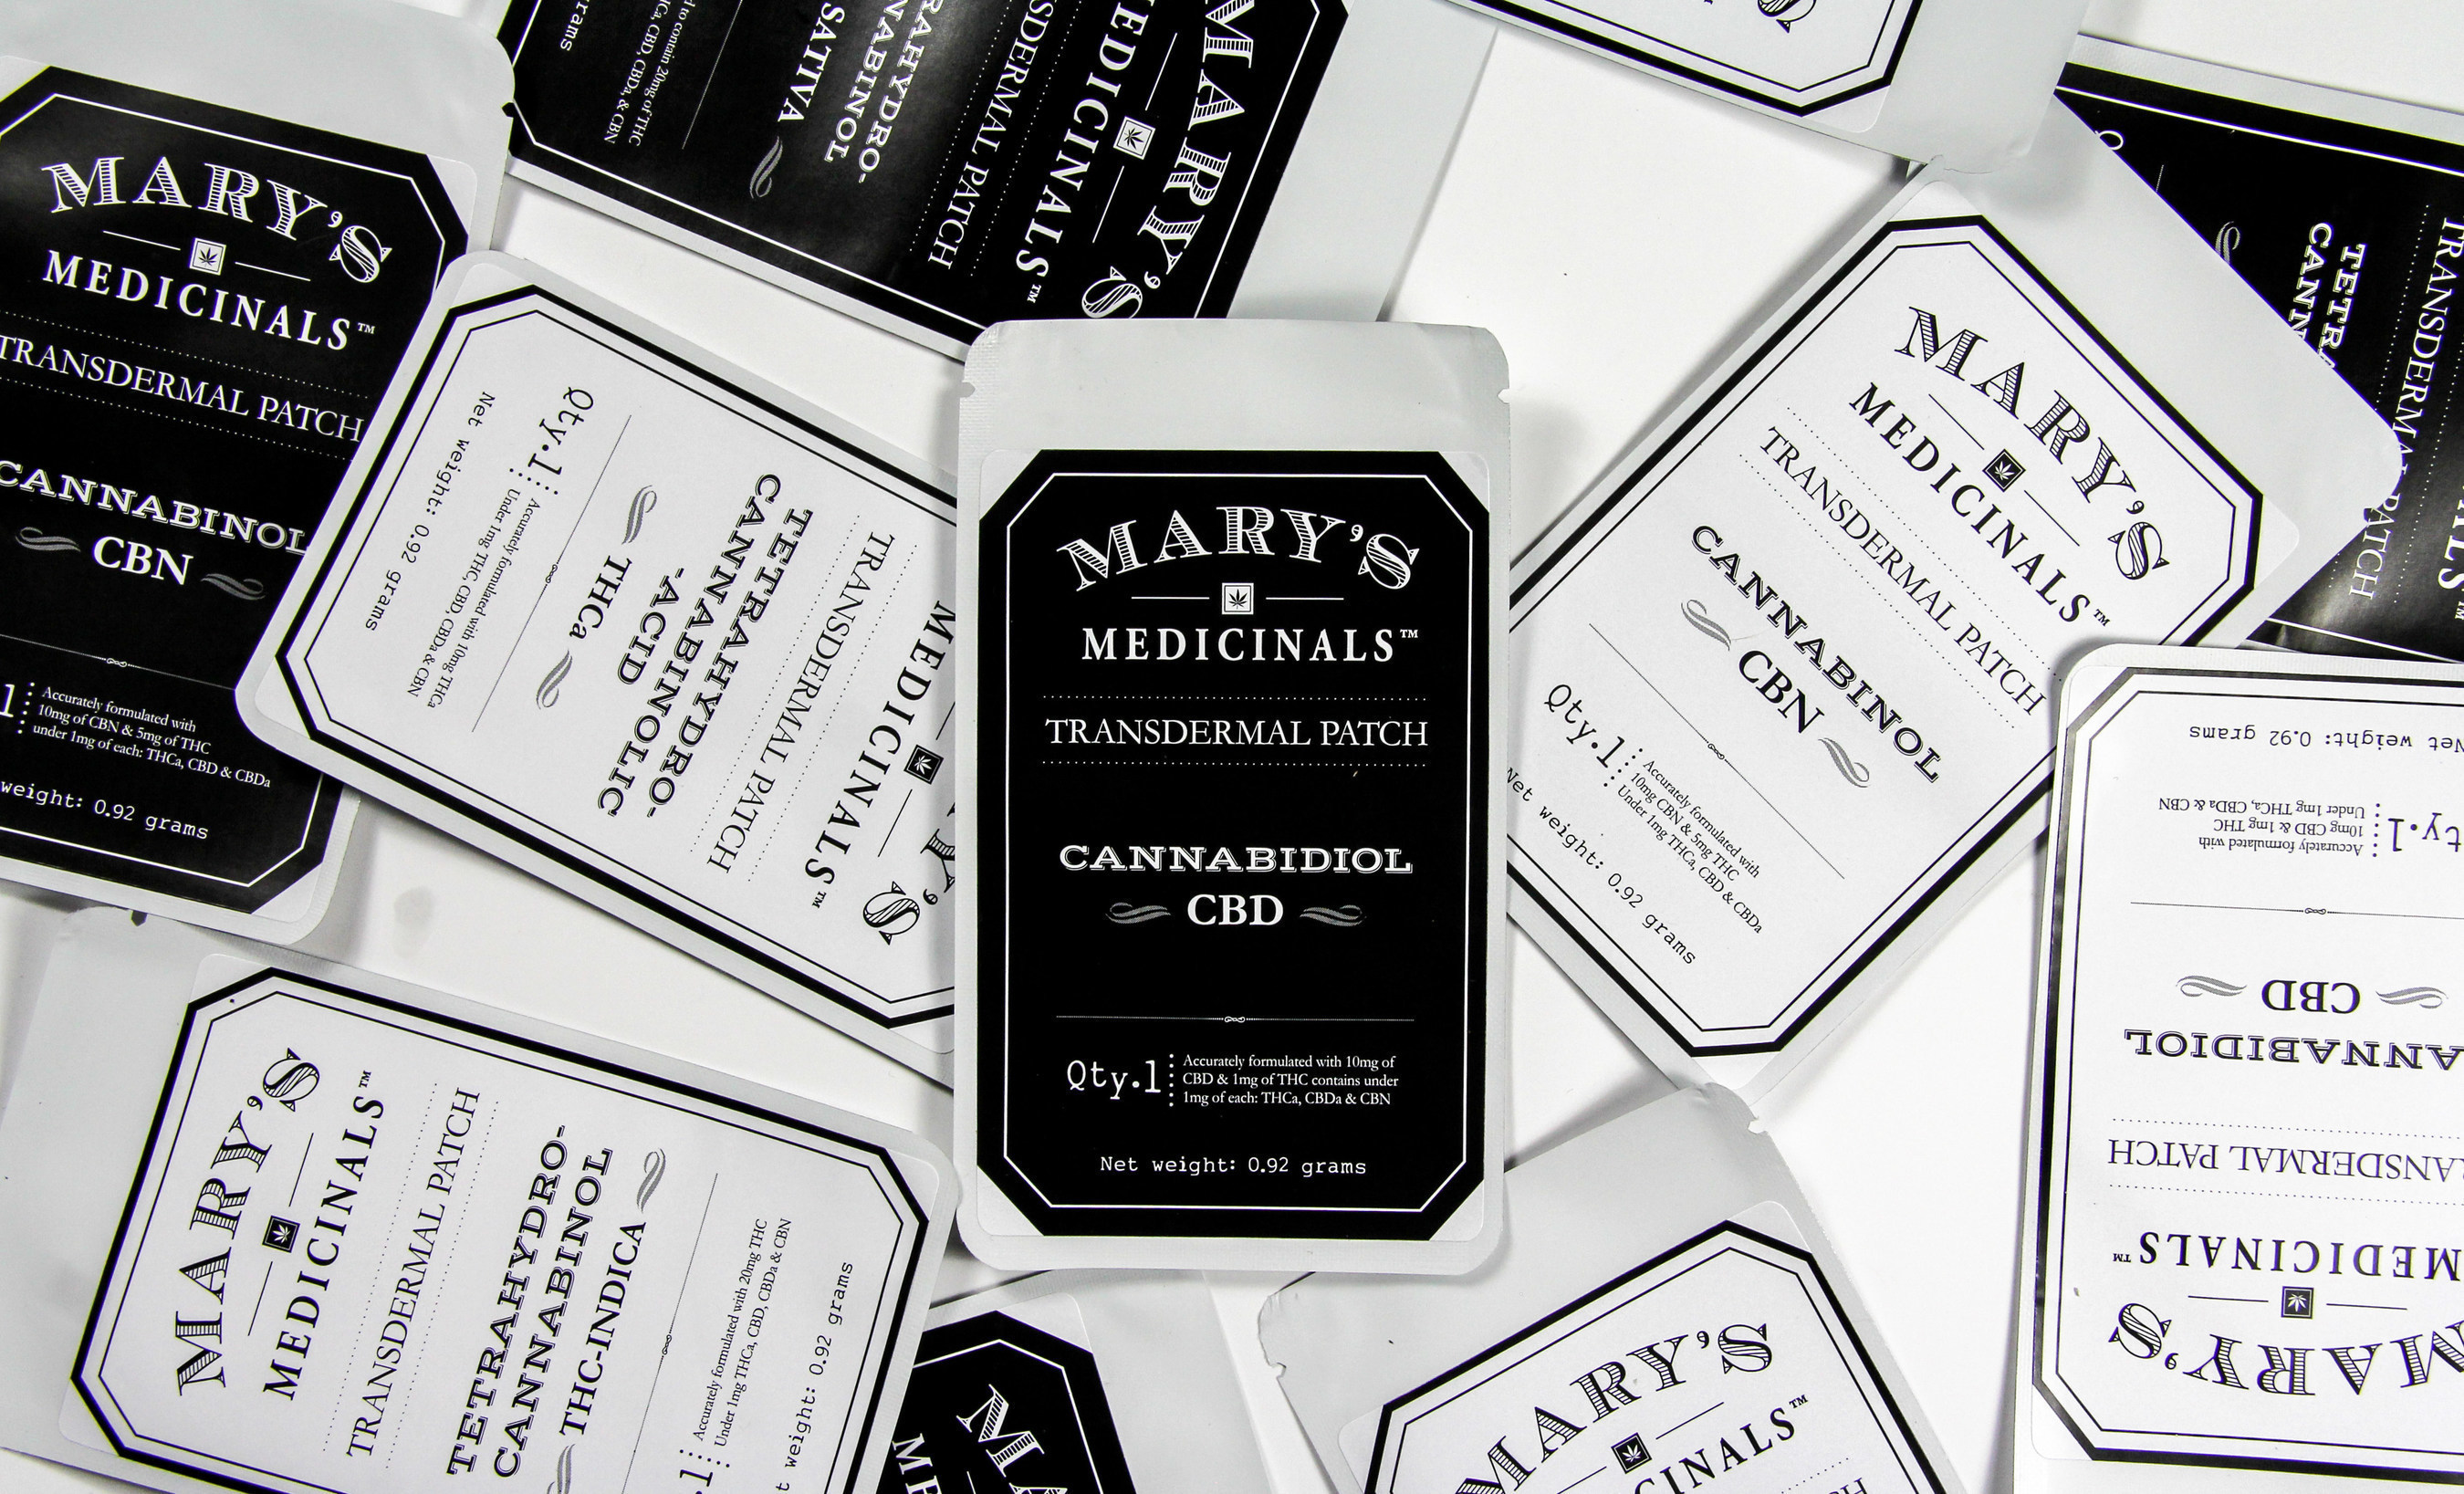 Mary's Medicinals Transdermal Cannabis Patches (Photo Credit: Alex L. Person)